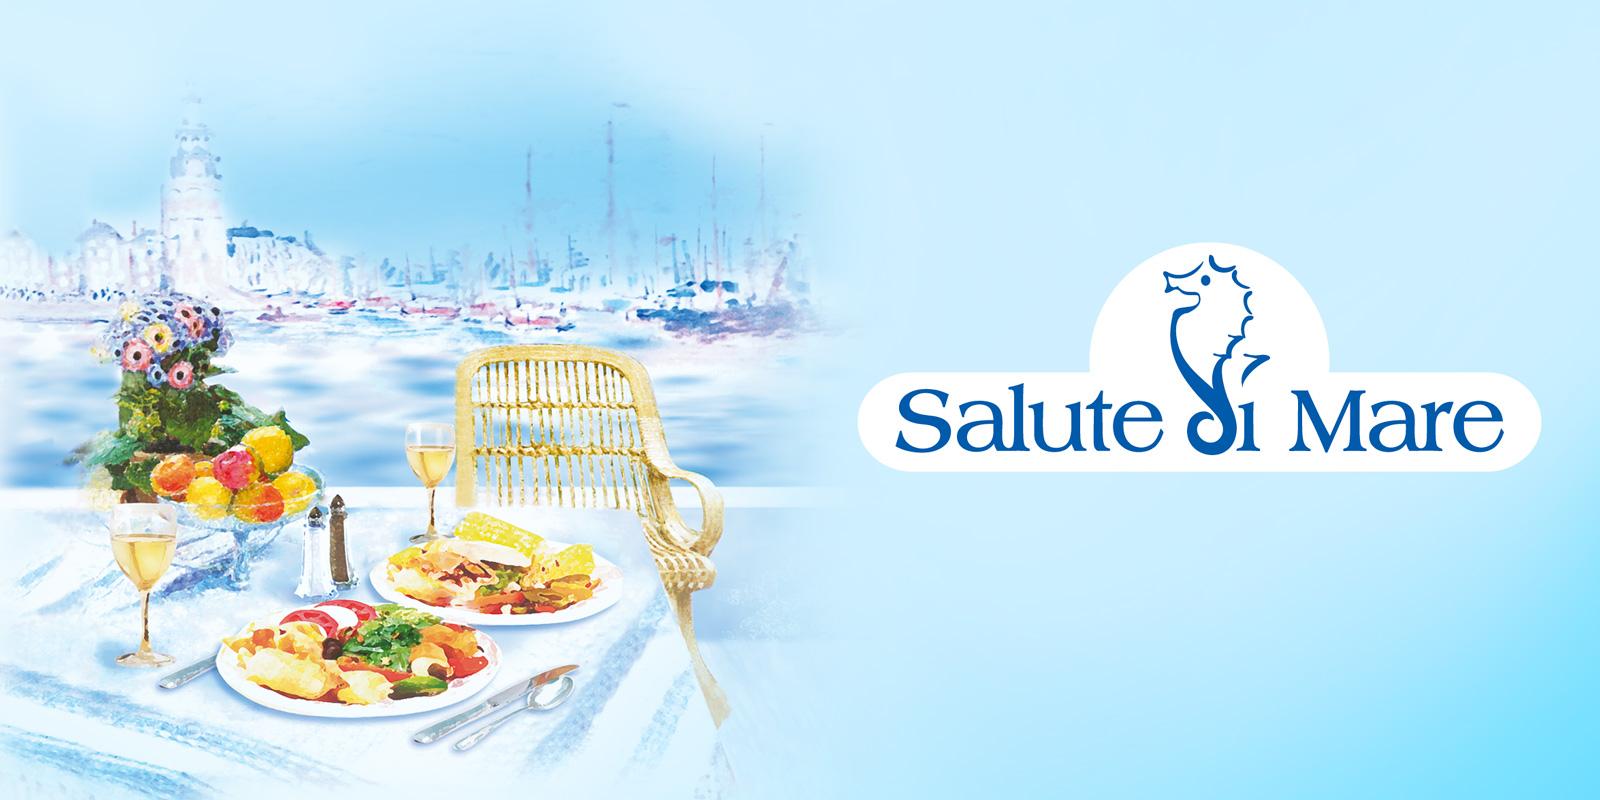 TM «Salute del mare»;;;;;;Разработка логотипа;;;;;;<span>Клиент:</span> Компания «Крупяной Дом»;;;;;;;;;;;;Разработка логотипа;;;;;;1